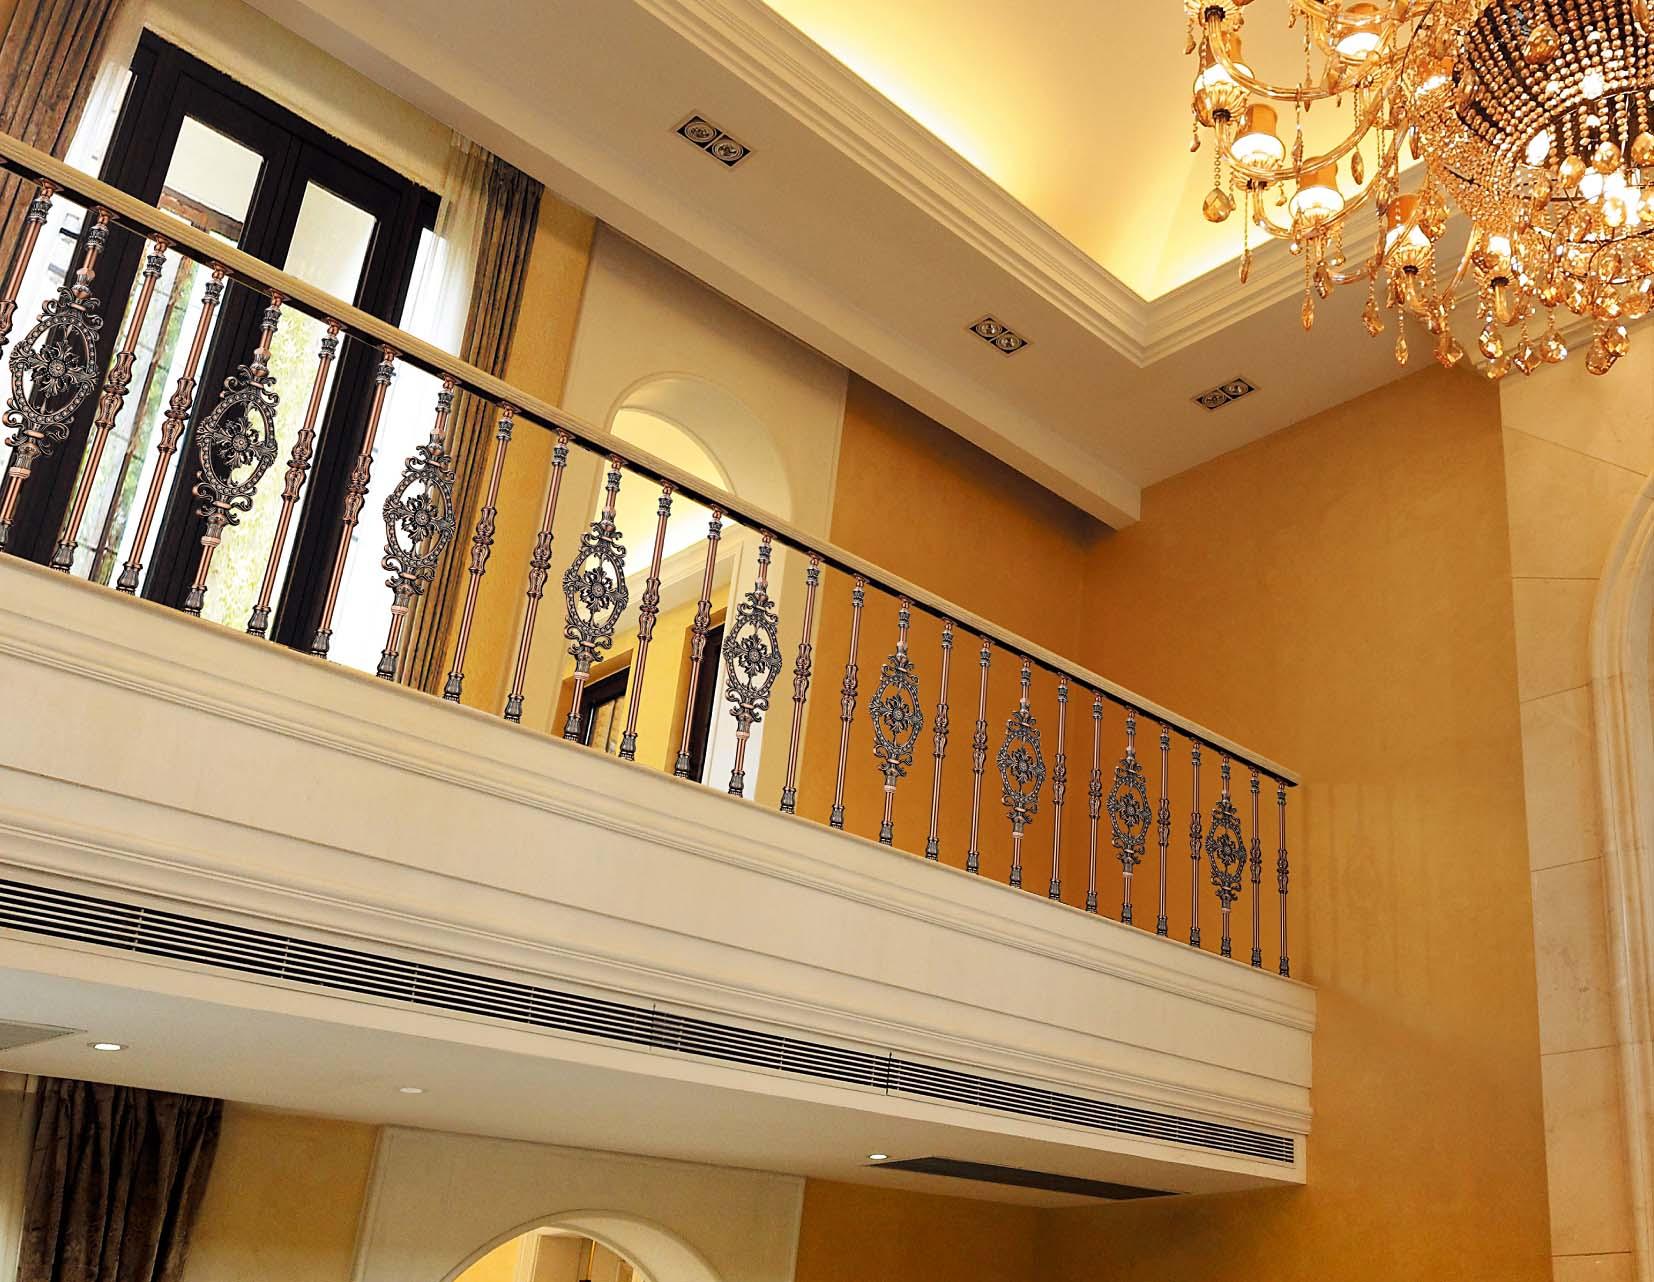 B010花溪谷/楼梯护栏/金属楼梯/别墅楼梯护栏